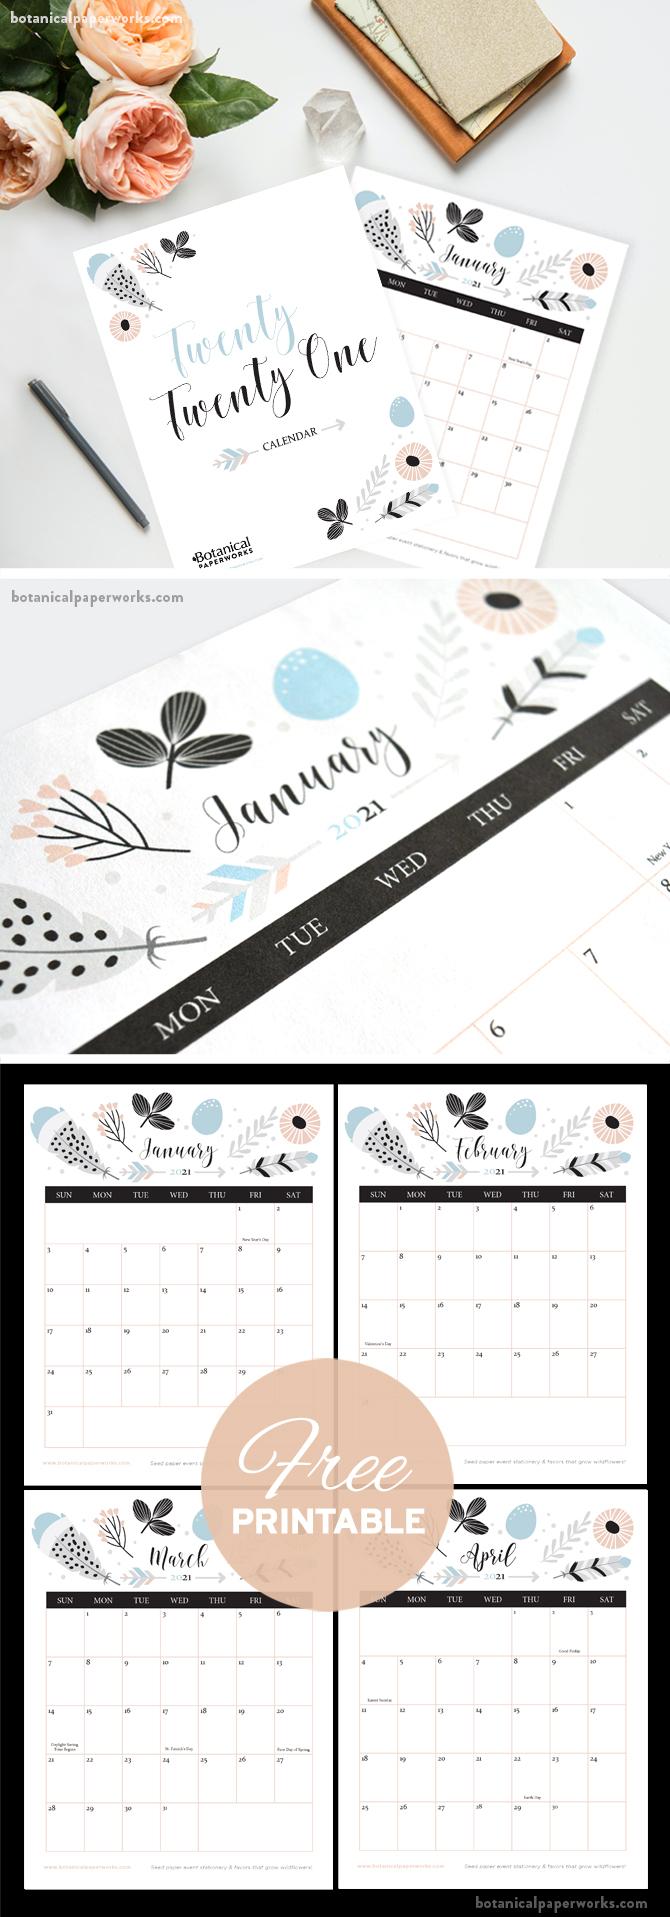 Free Printable 2021 Calendars | Botanical Paperworks pertaining to 2021 I-9 Form Printable